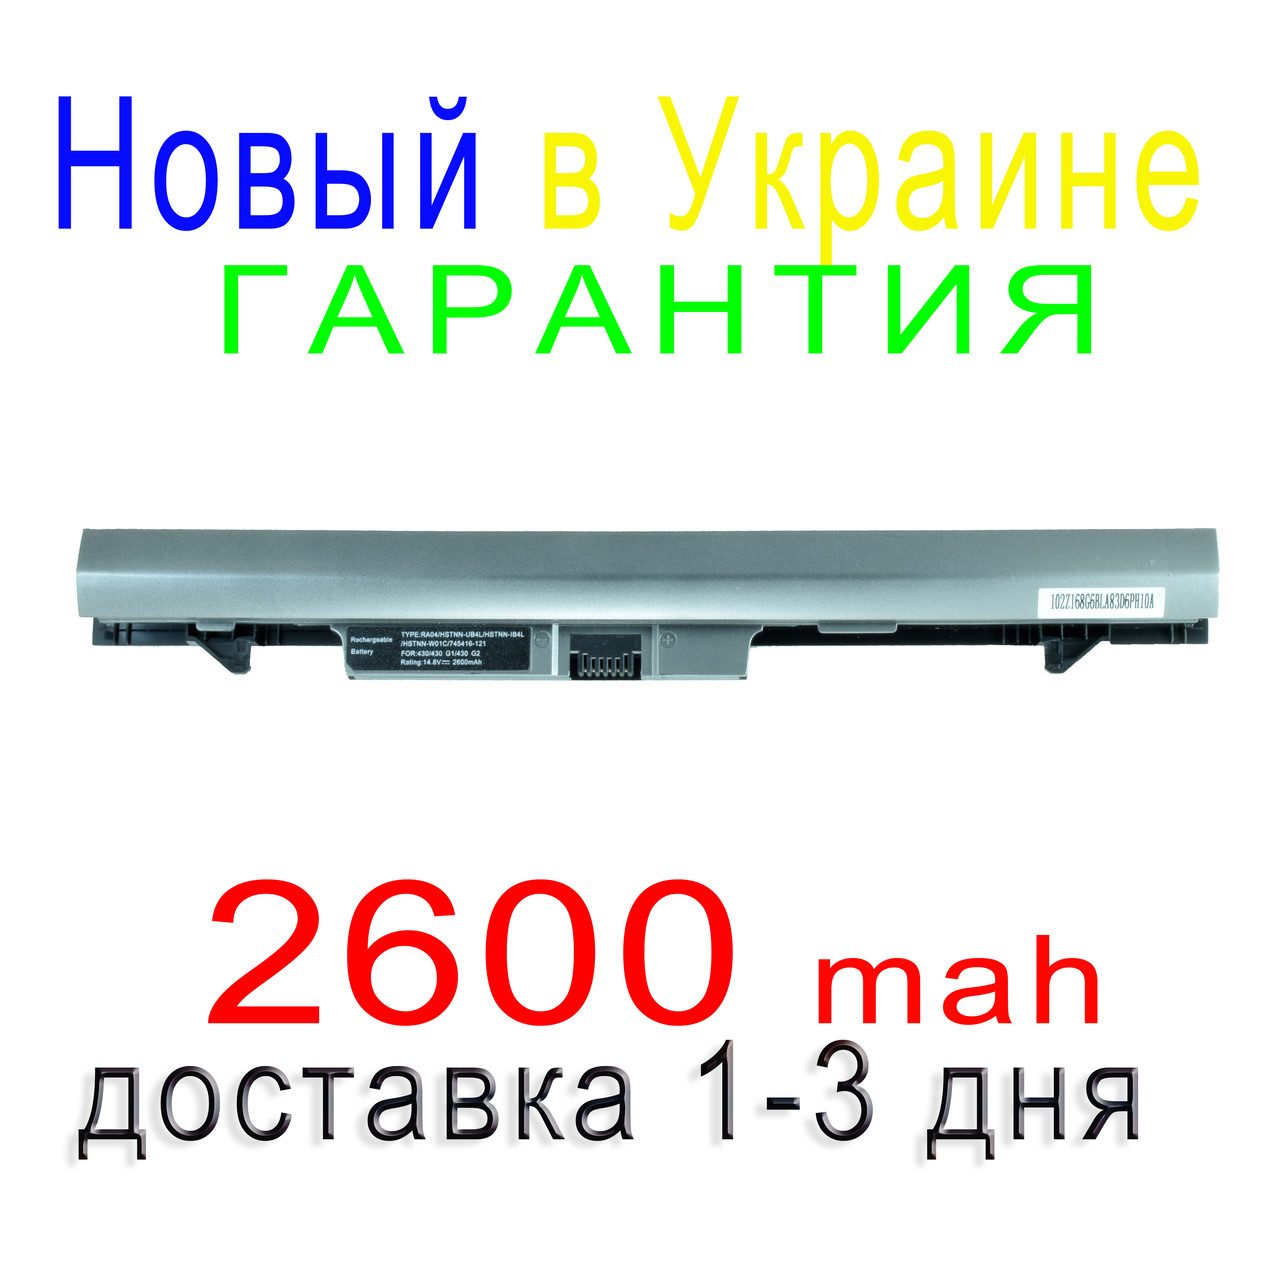 Аккумулятор батарея HP ProBook 430 G1 G2 RA04 HSTNN-UB4L HSTNN-IB4L HS